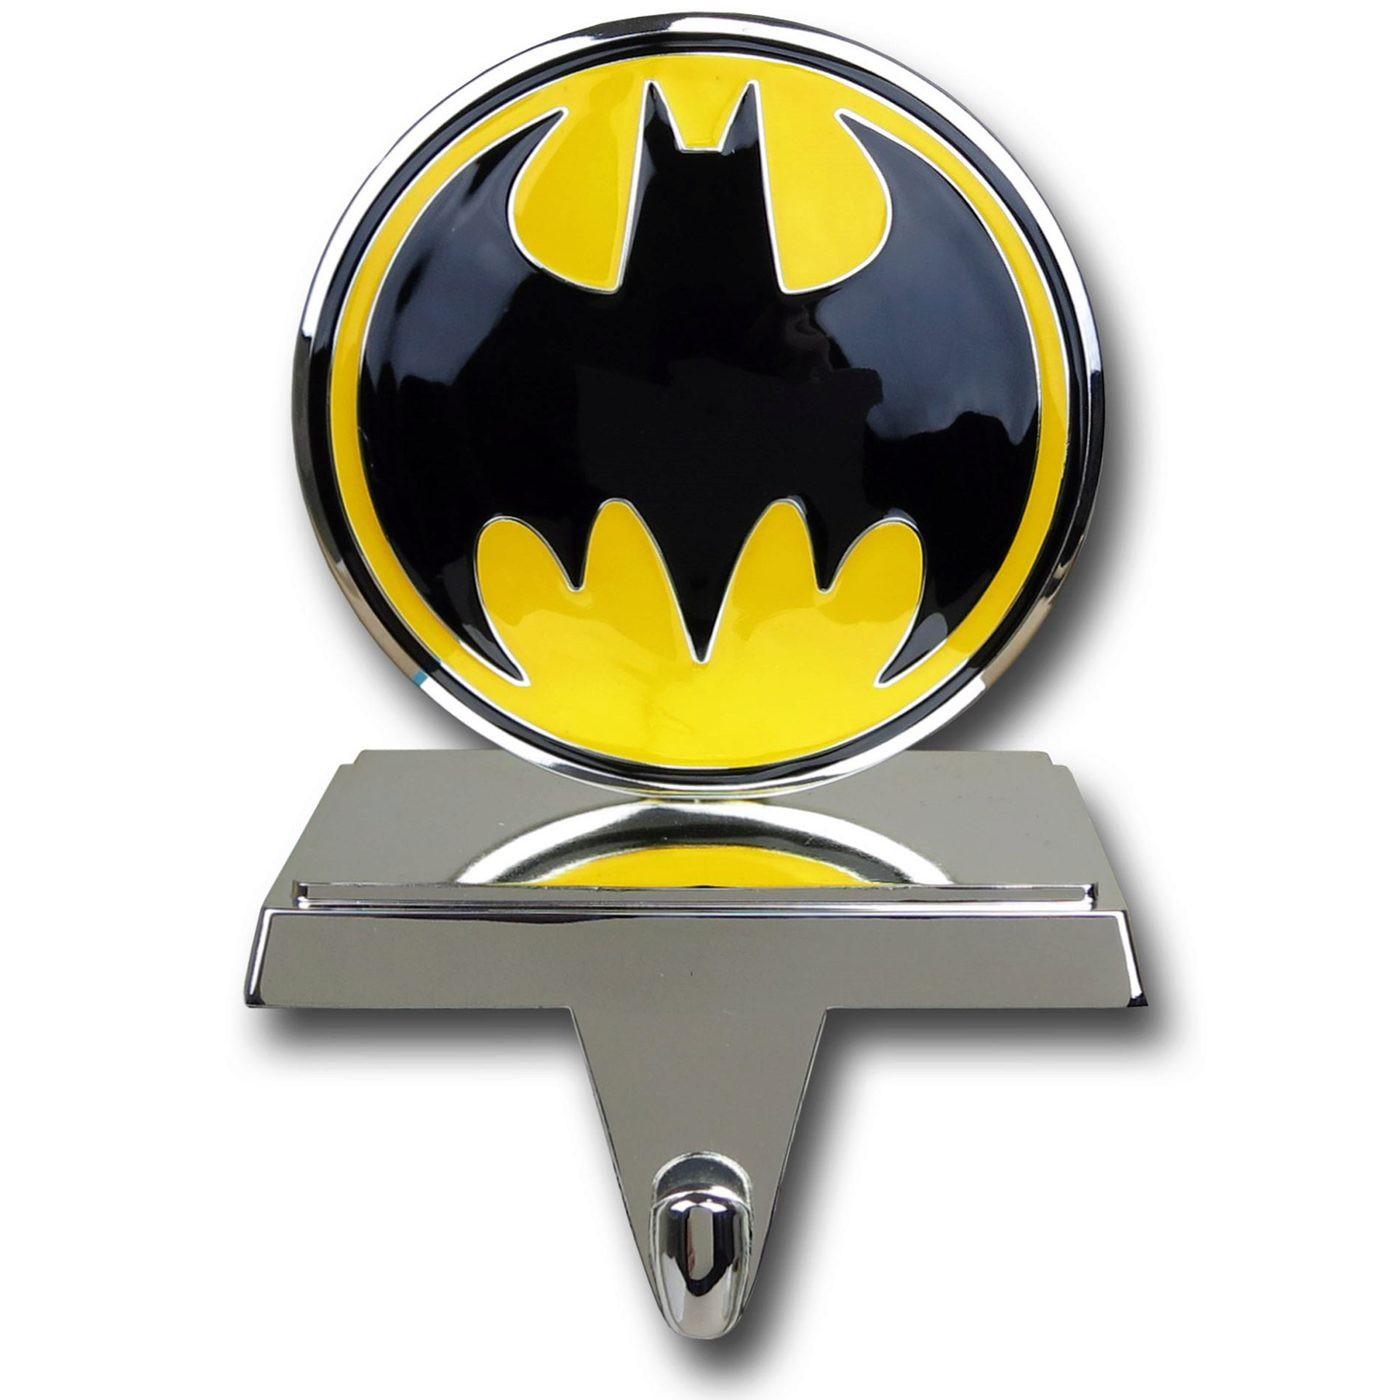 Batman Stocking Holder